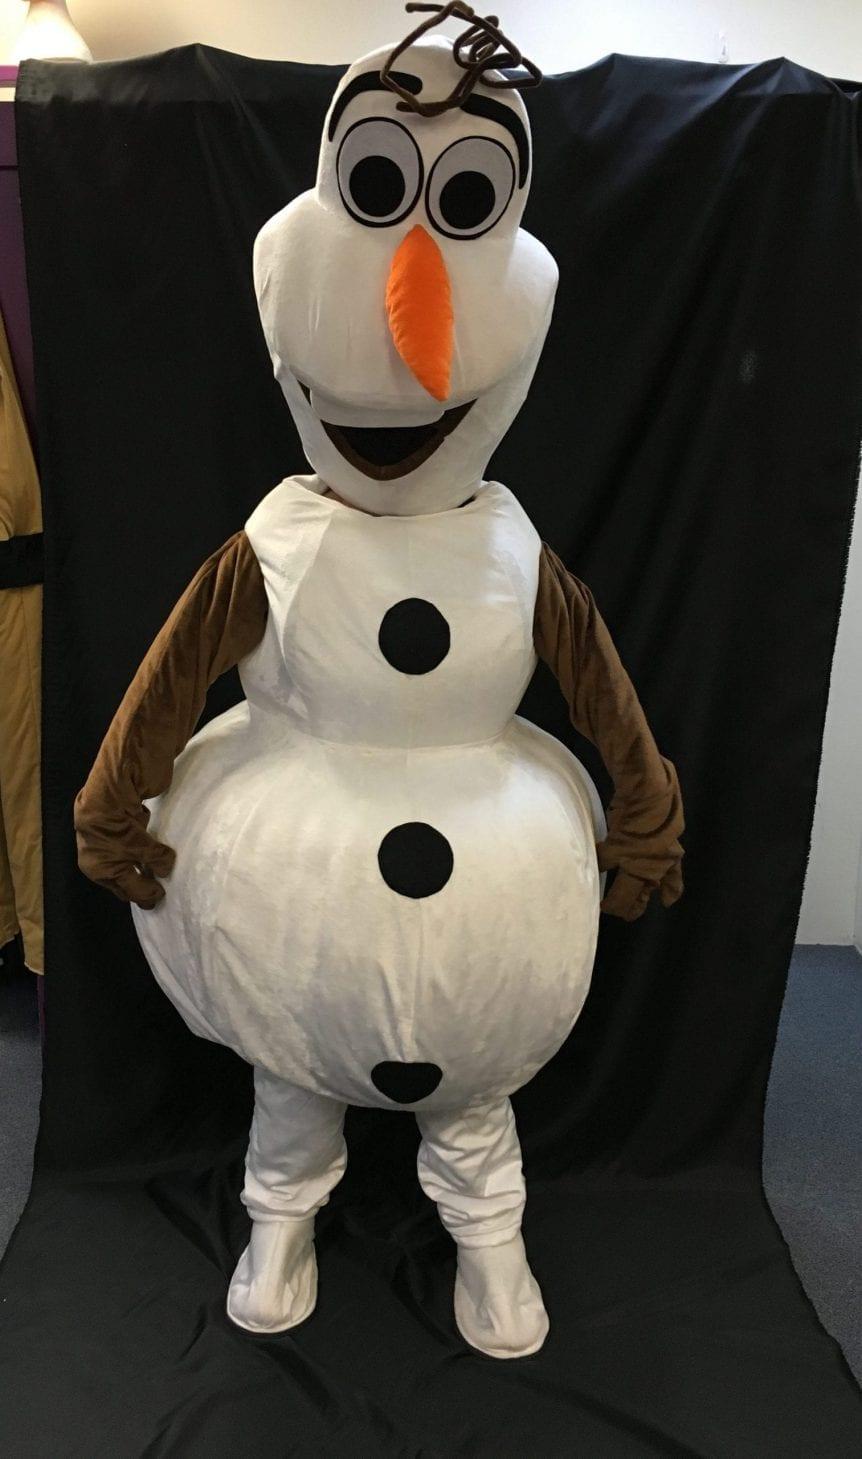 OLAF SNOWMAN (MASCOT)